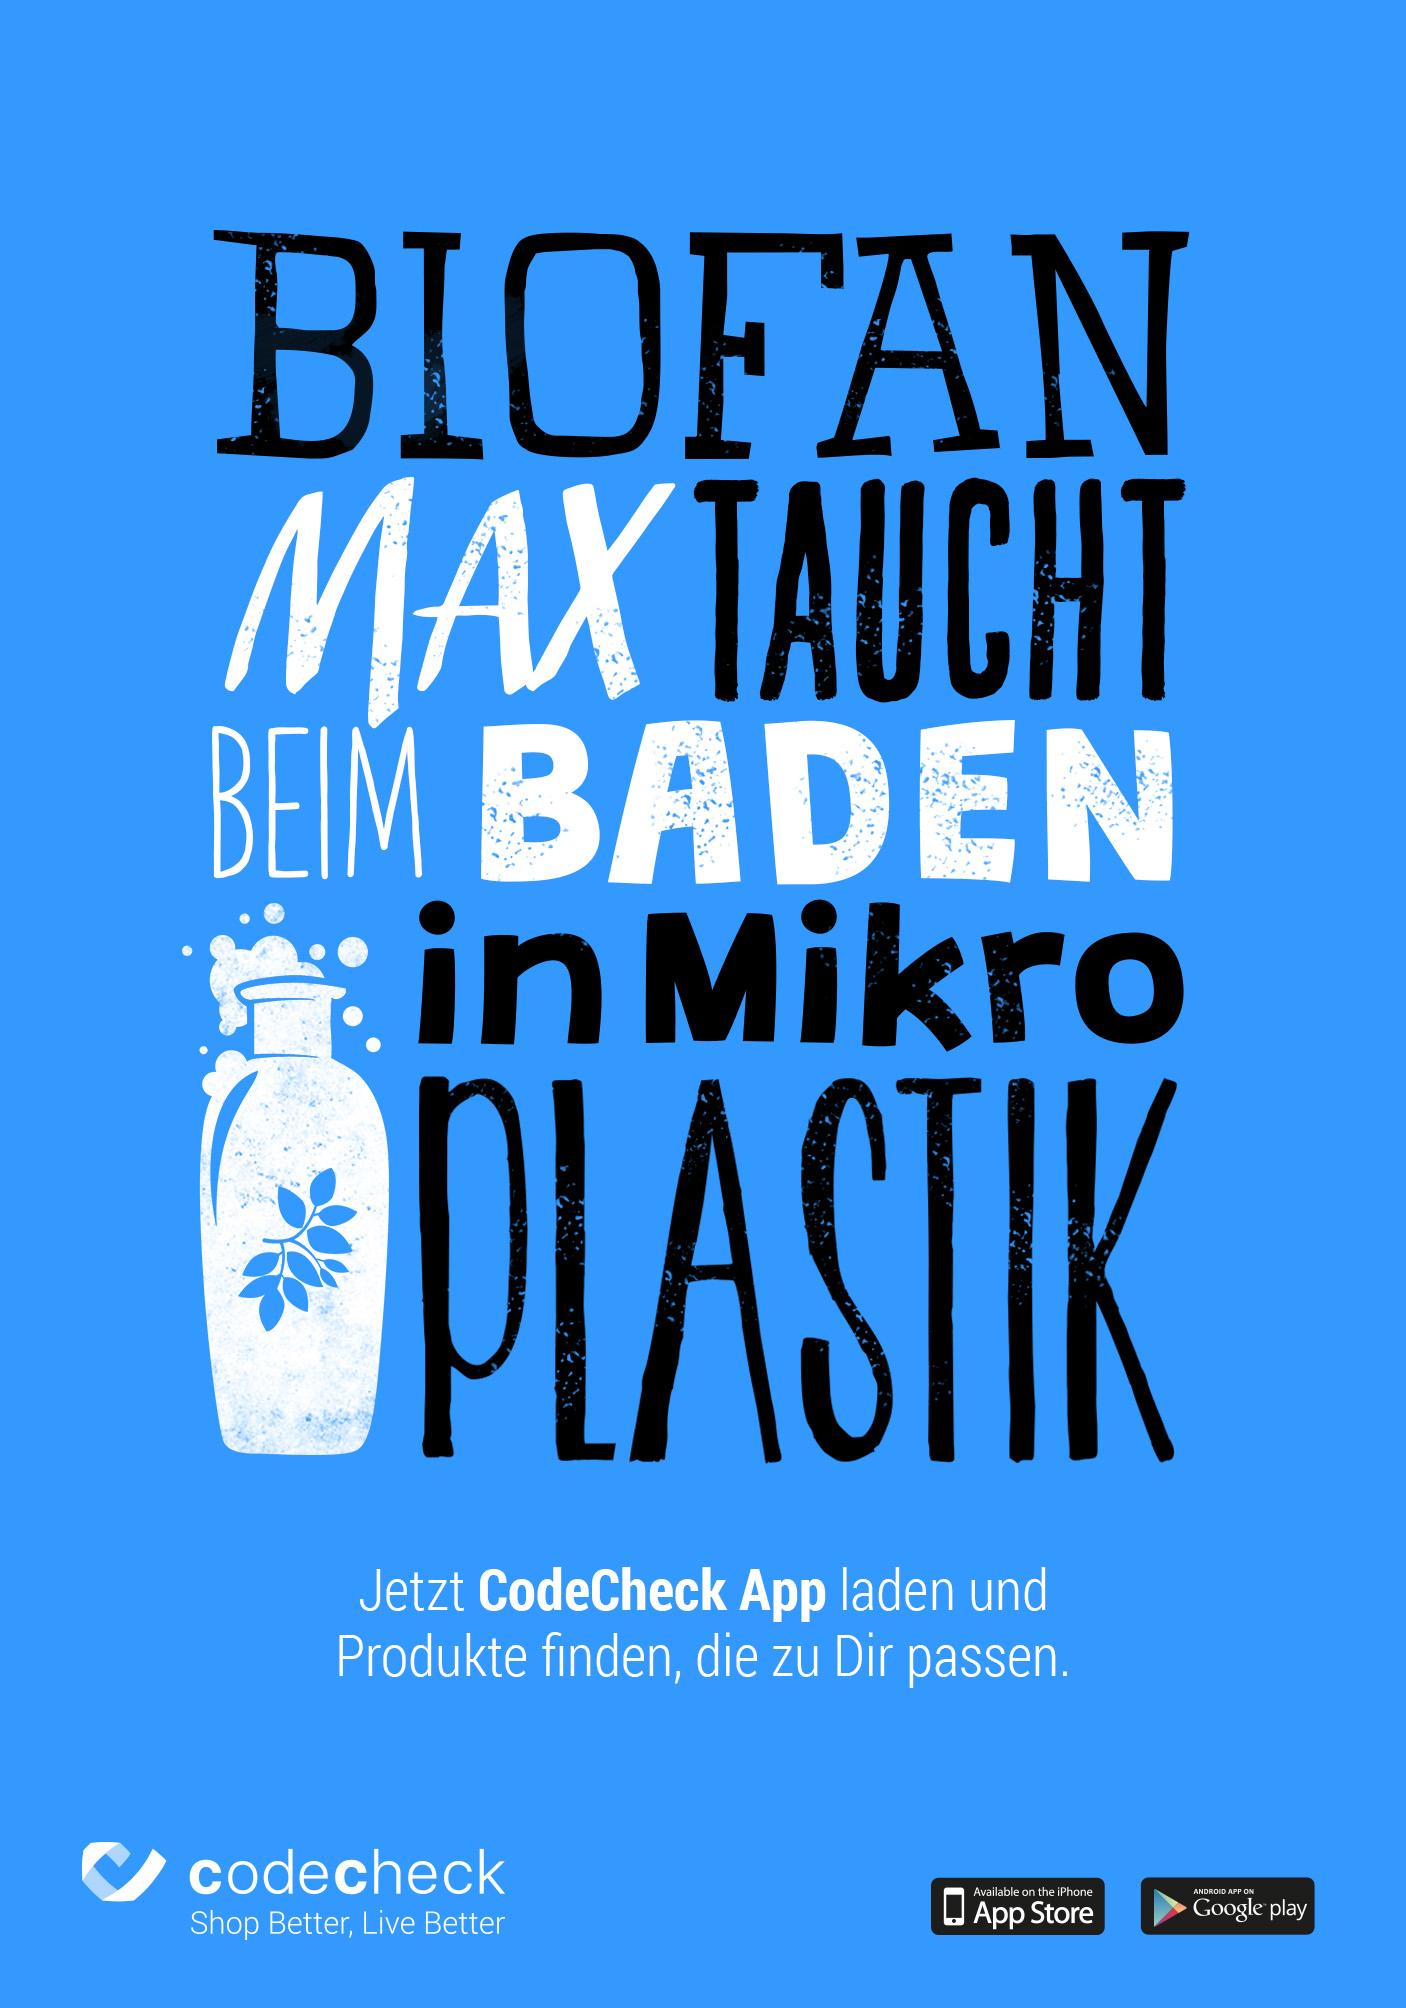 Codecheck_Plakat_Biofan